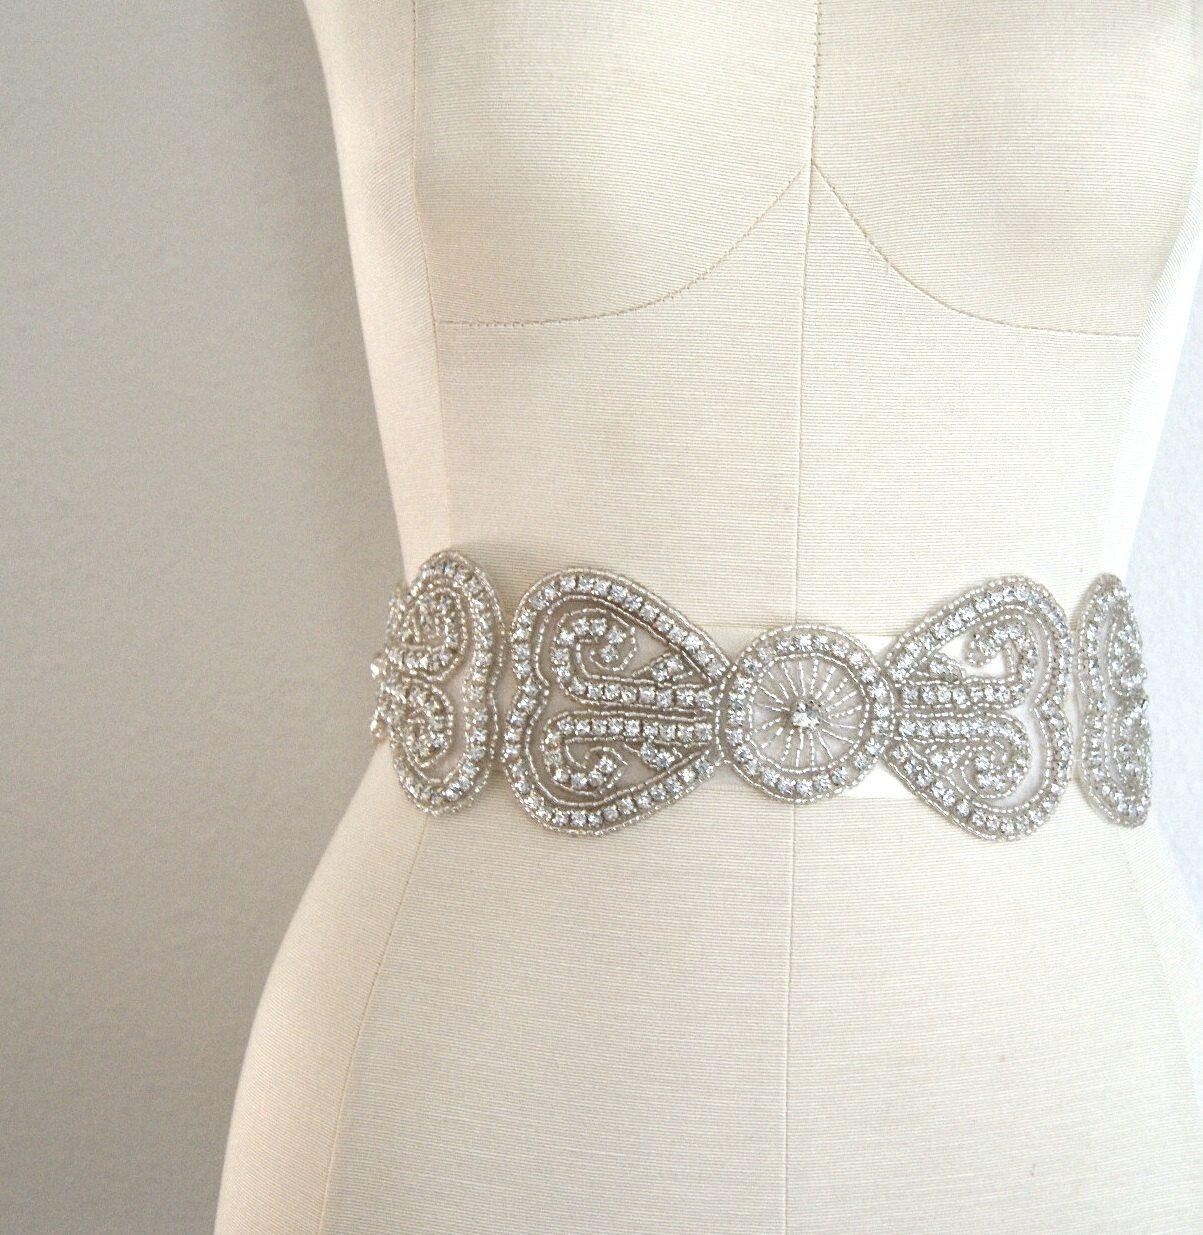 Burlap wedding dress sash  Deco Bridal Sash THE BARDOT Rhinestone Encrusted by VenustBridal